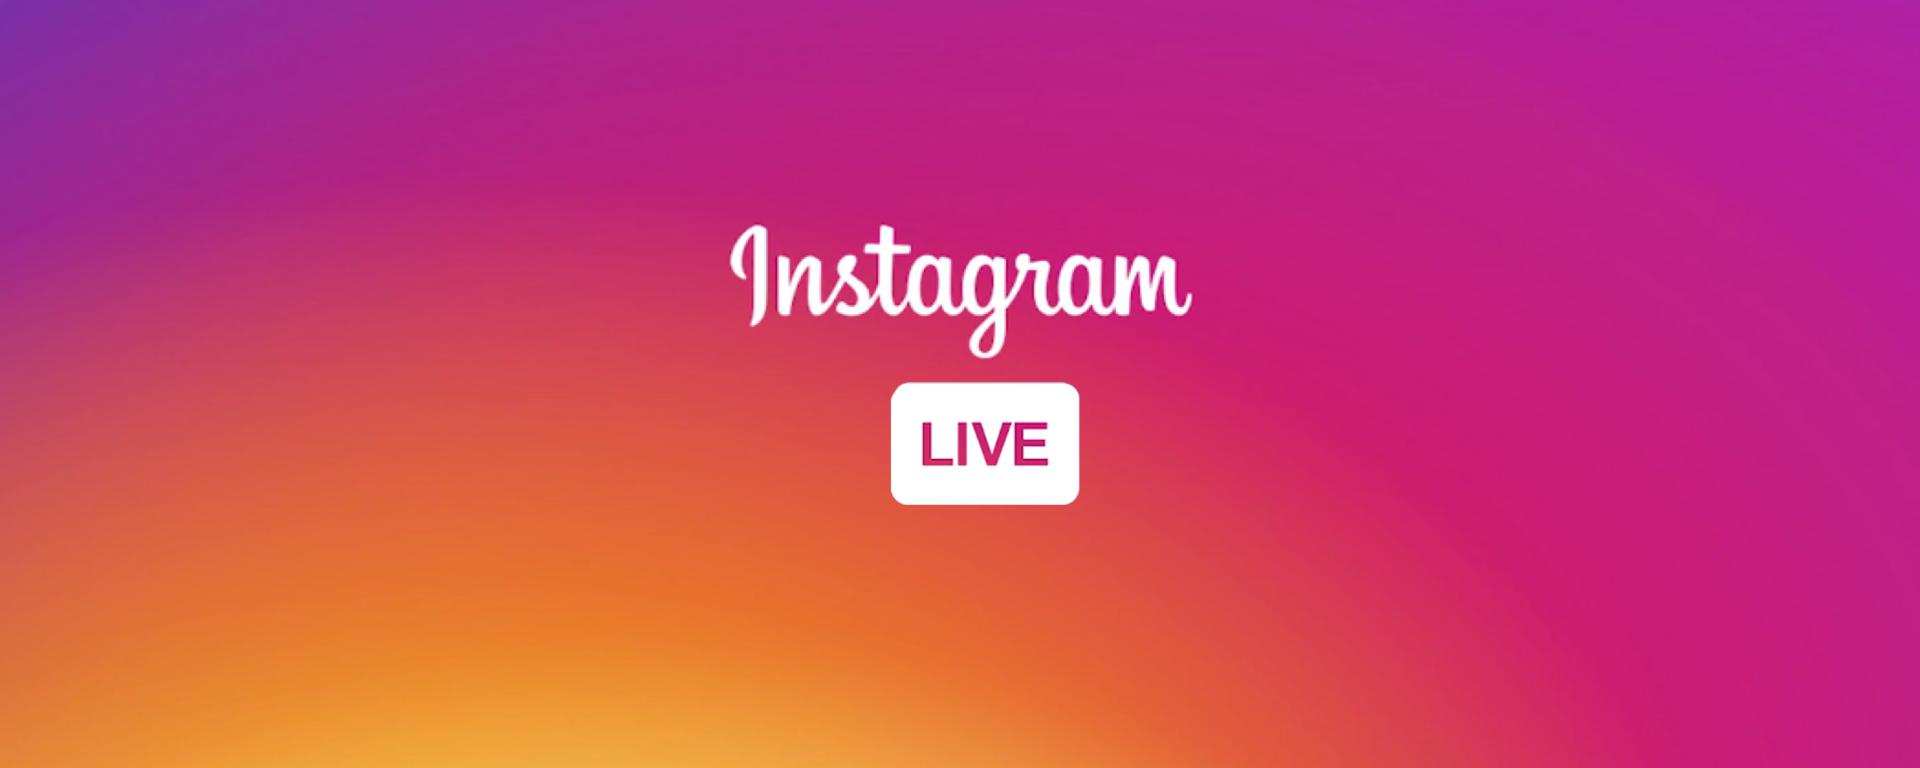 Instagram Live opnemen